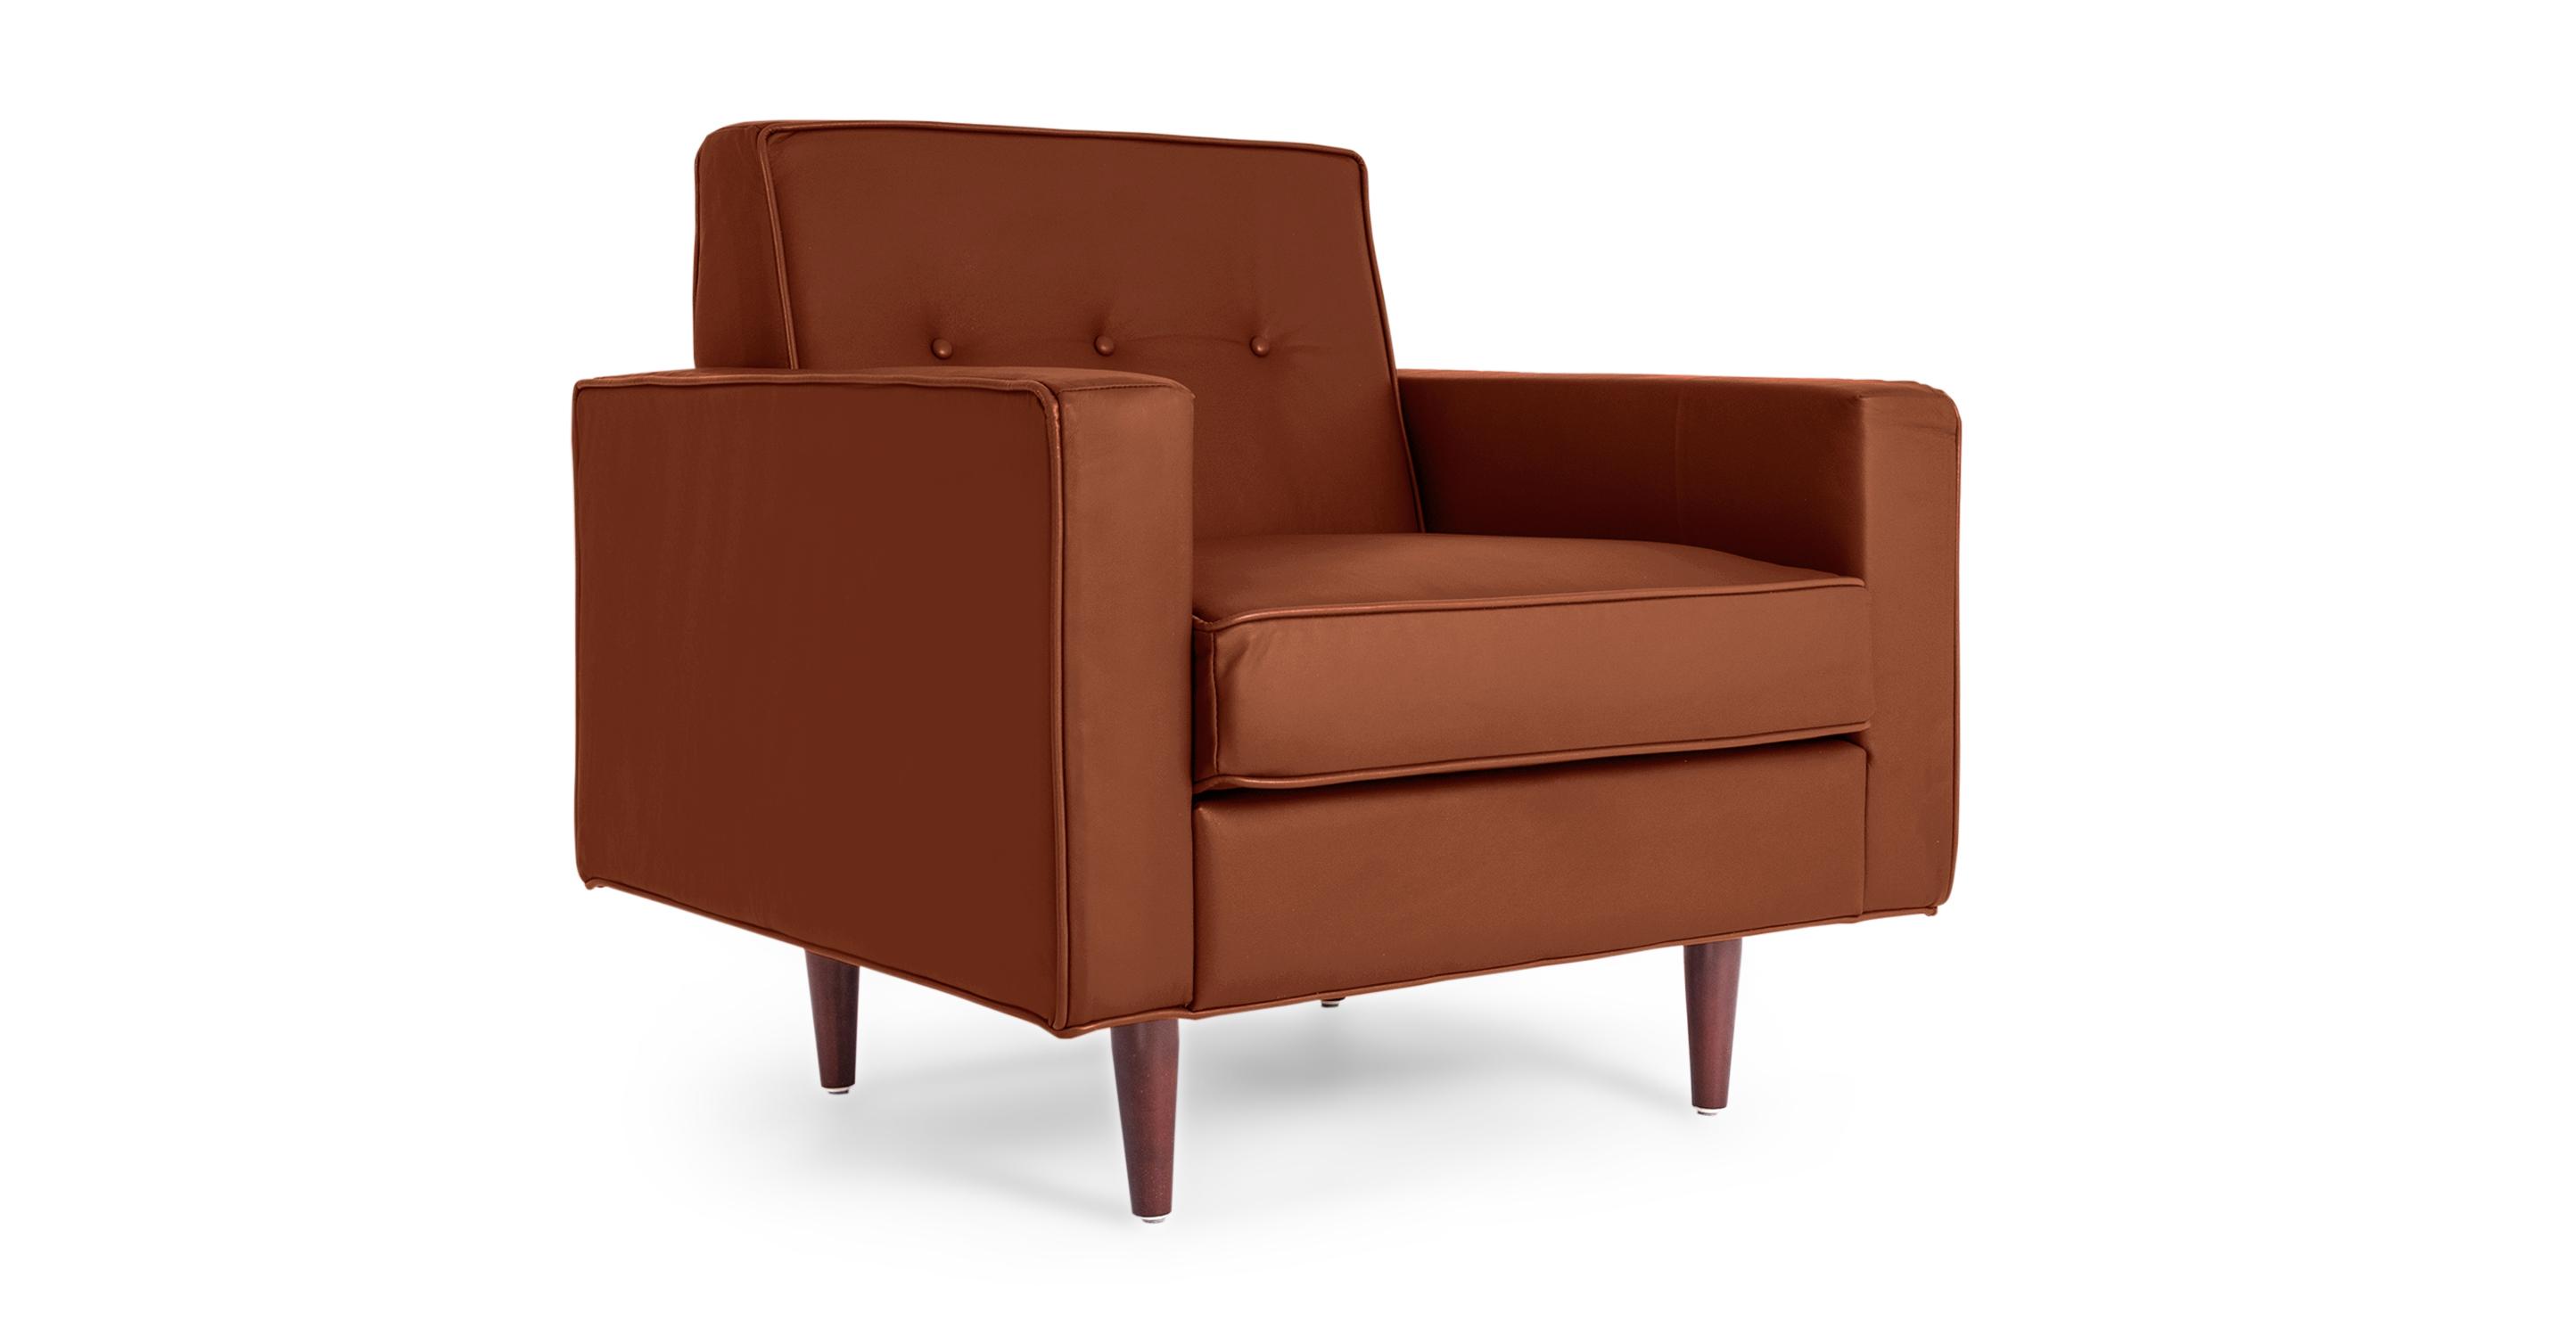 "Eleanor 36"" Leather Chair, Chestnut Aniline"